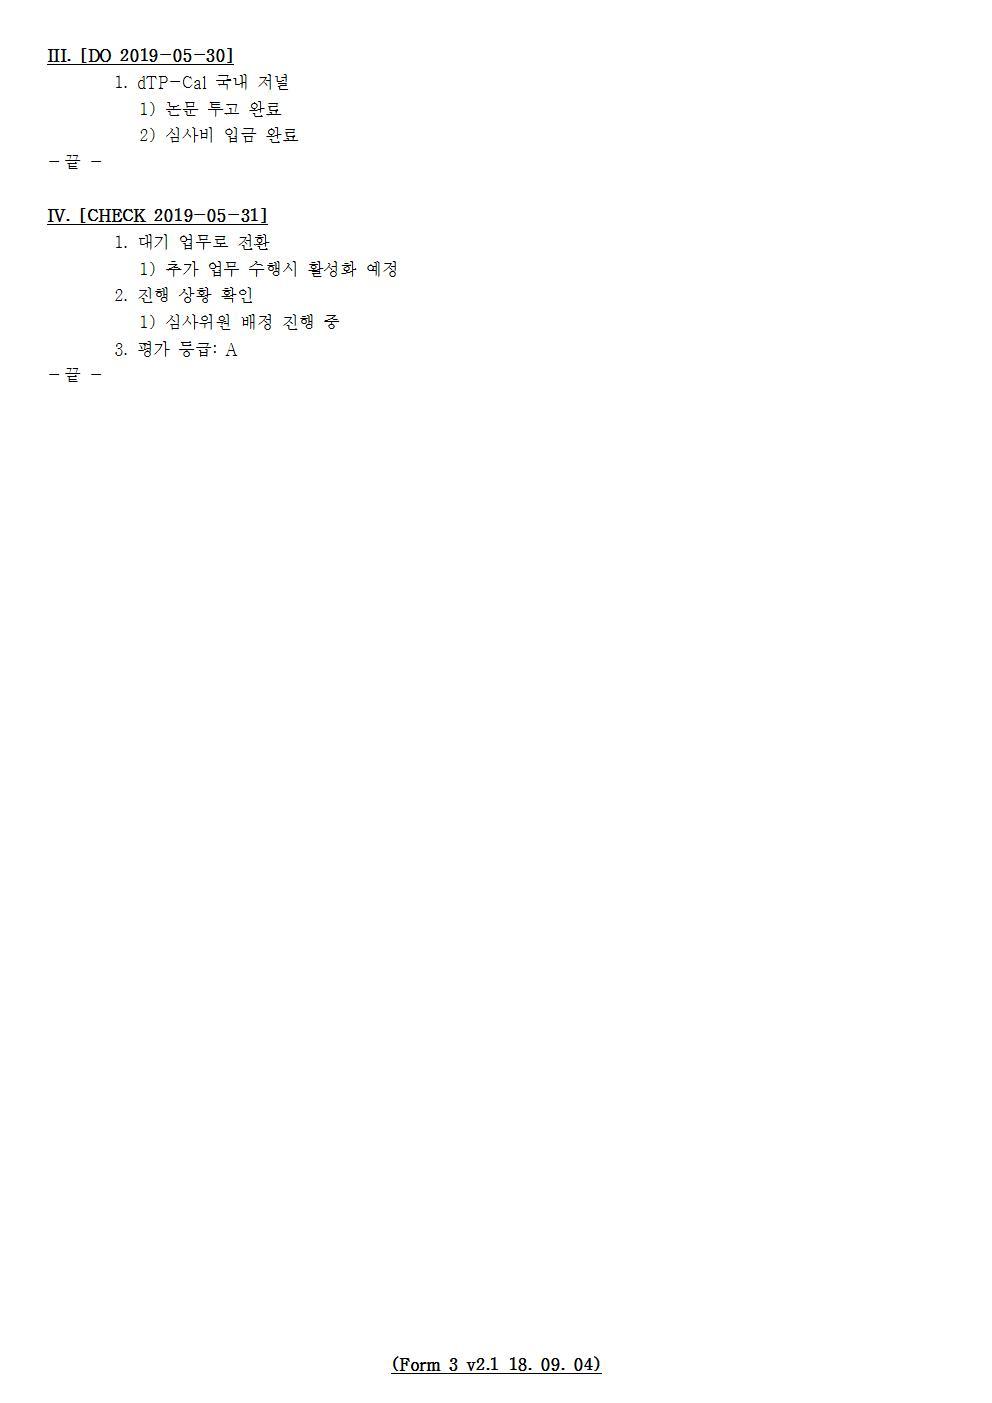 D-[19-012-PP-04]-[dTP-국내]-[2019-05-24][JS]-[19-5-5]-[P+D+C]002.jpg